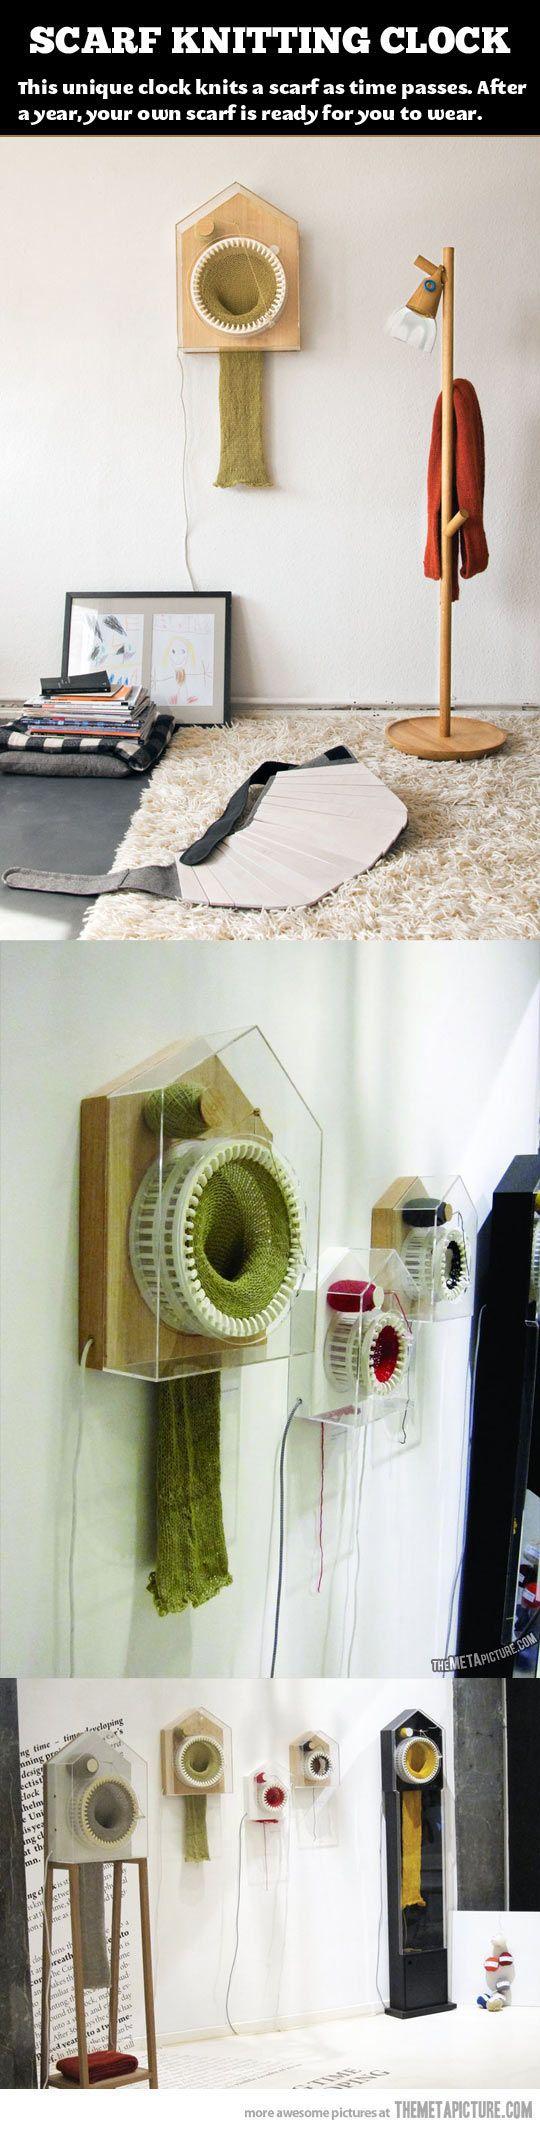 Amazing knitting clock…